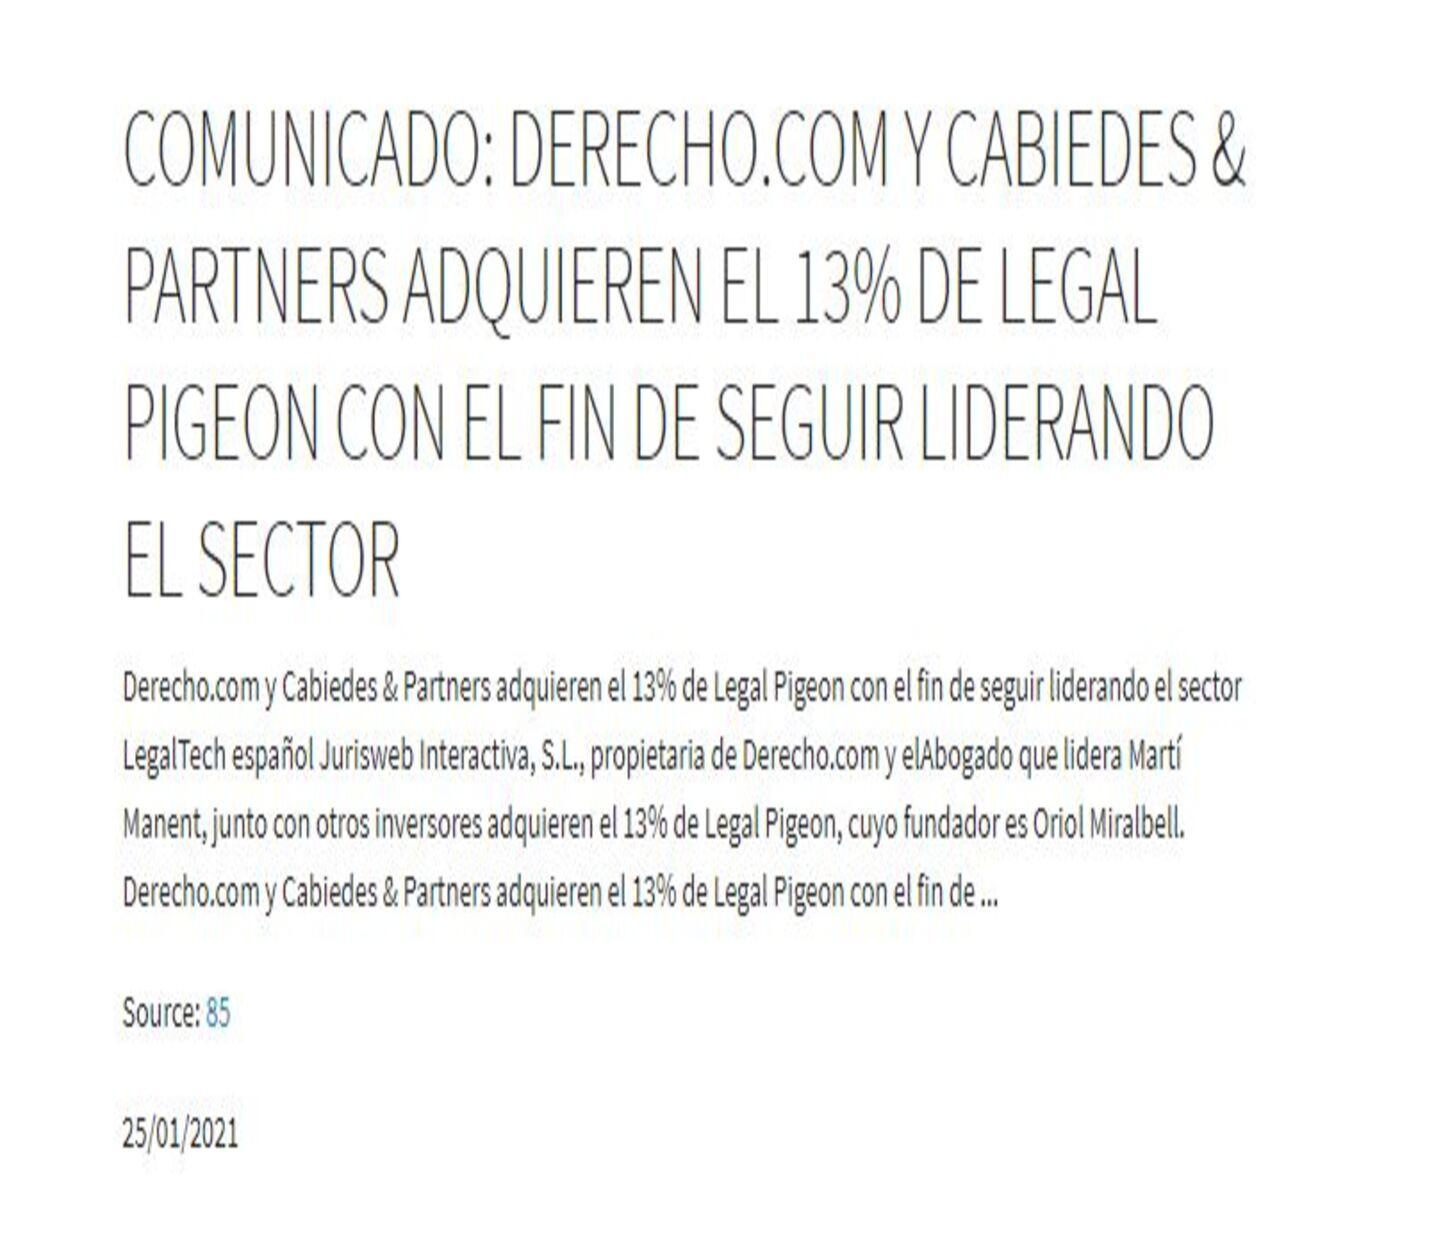 Vityarustov Legal Pigeon abogado sustituto